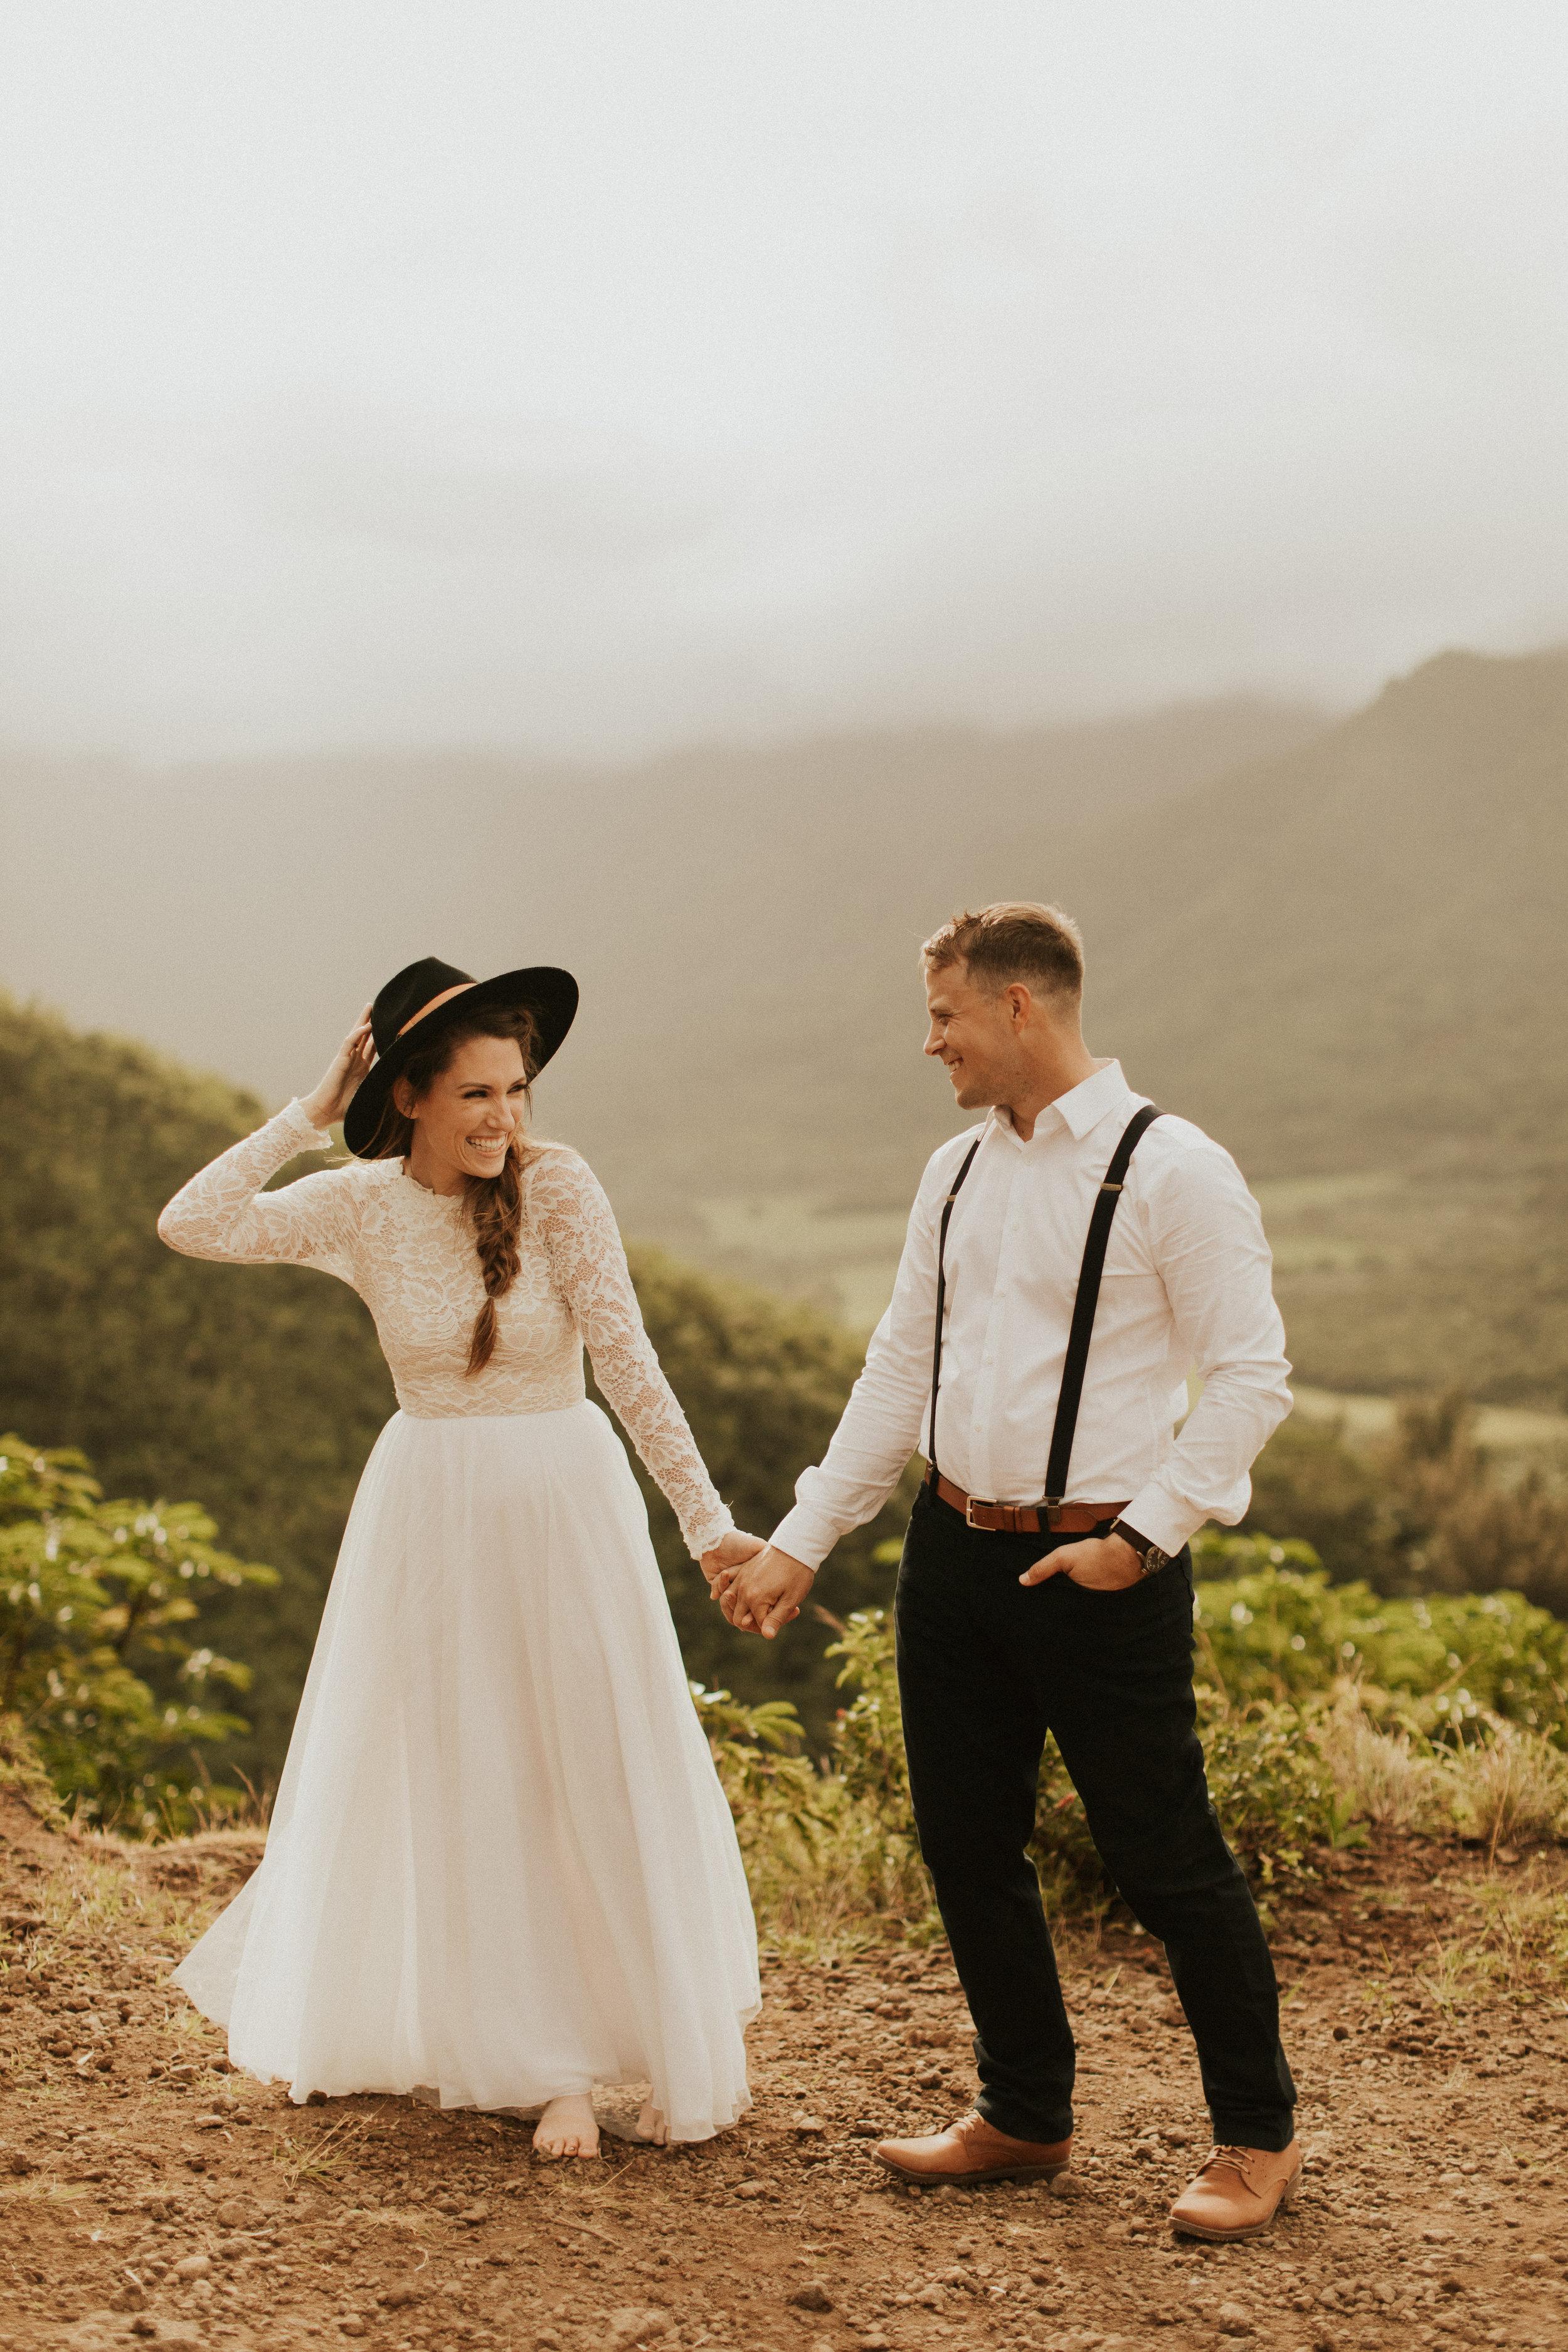 the-mclachlans-destination-elopement-photographers-mountain-hike-sena-eric-115.jpg